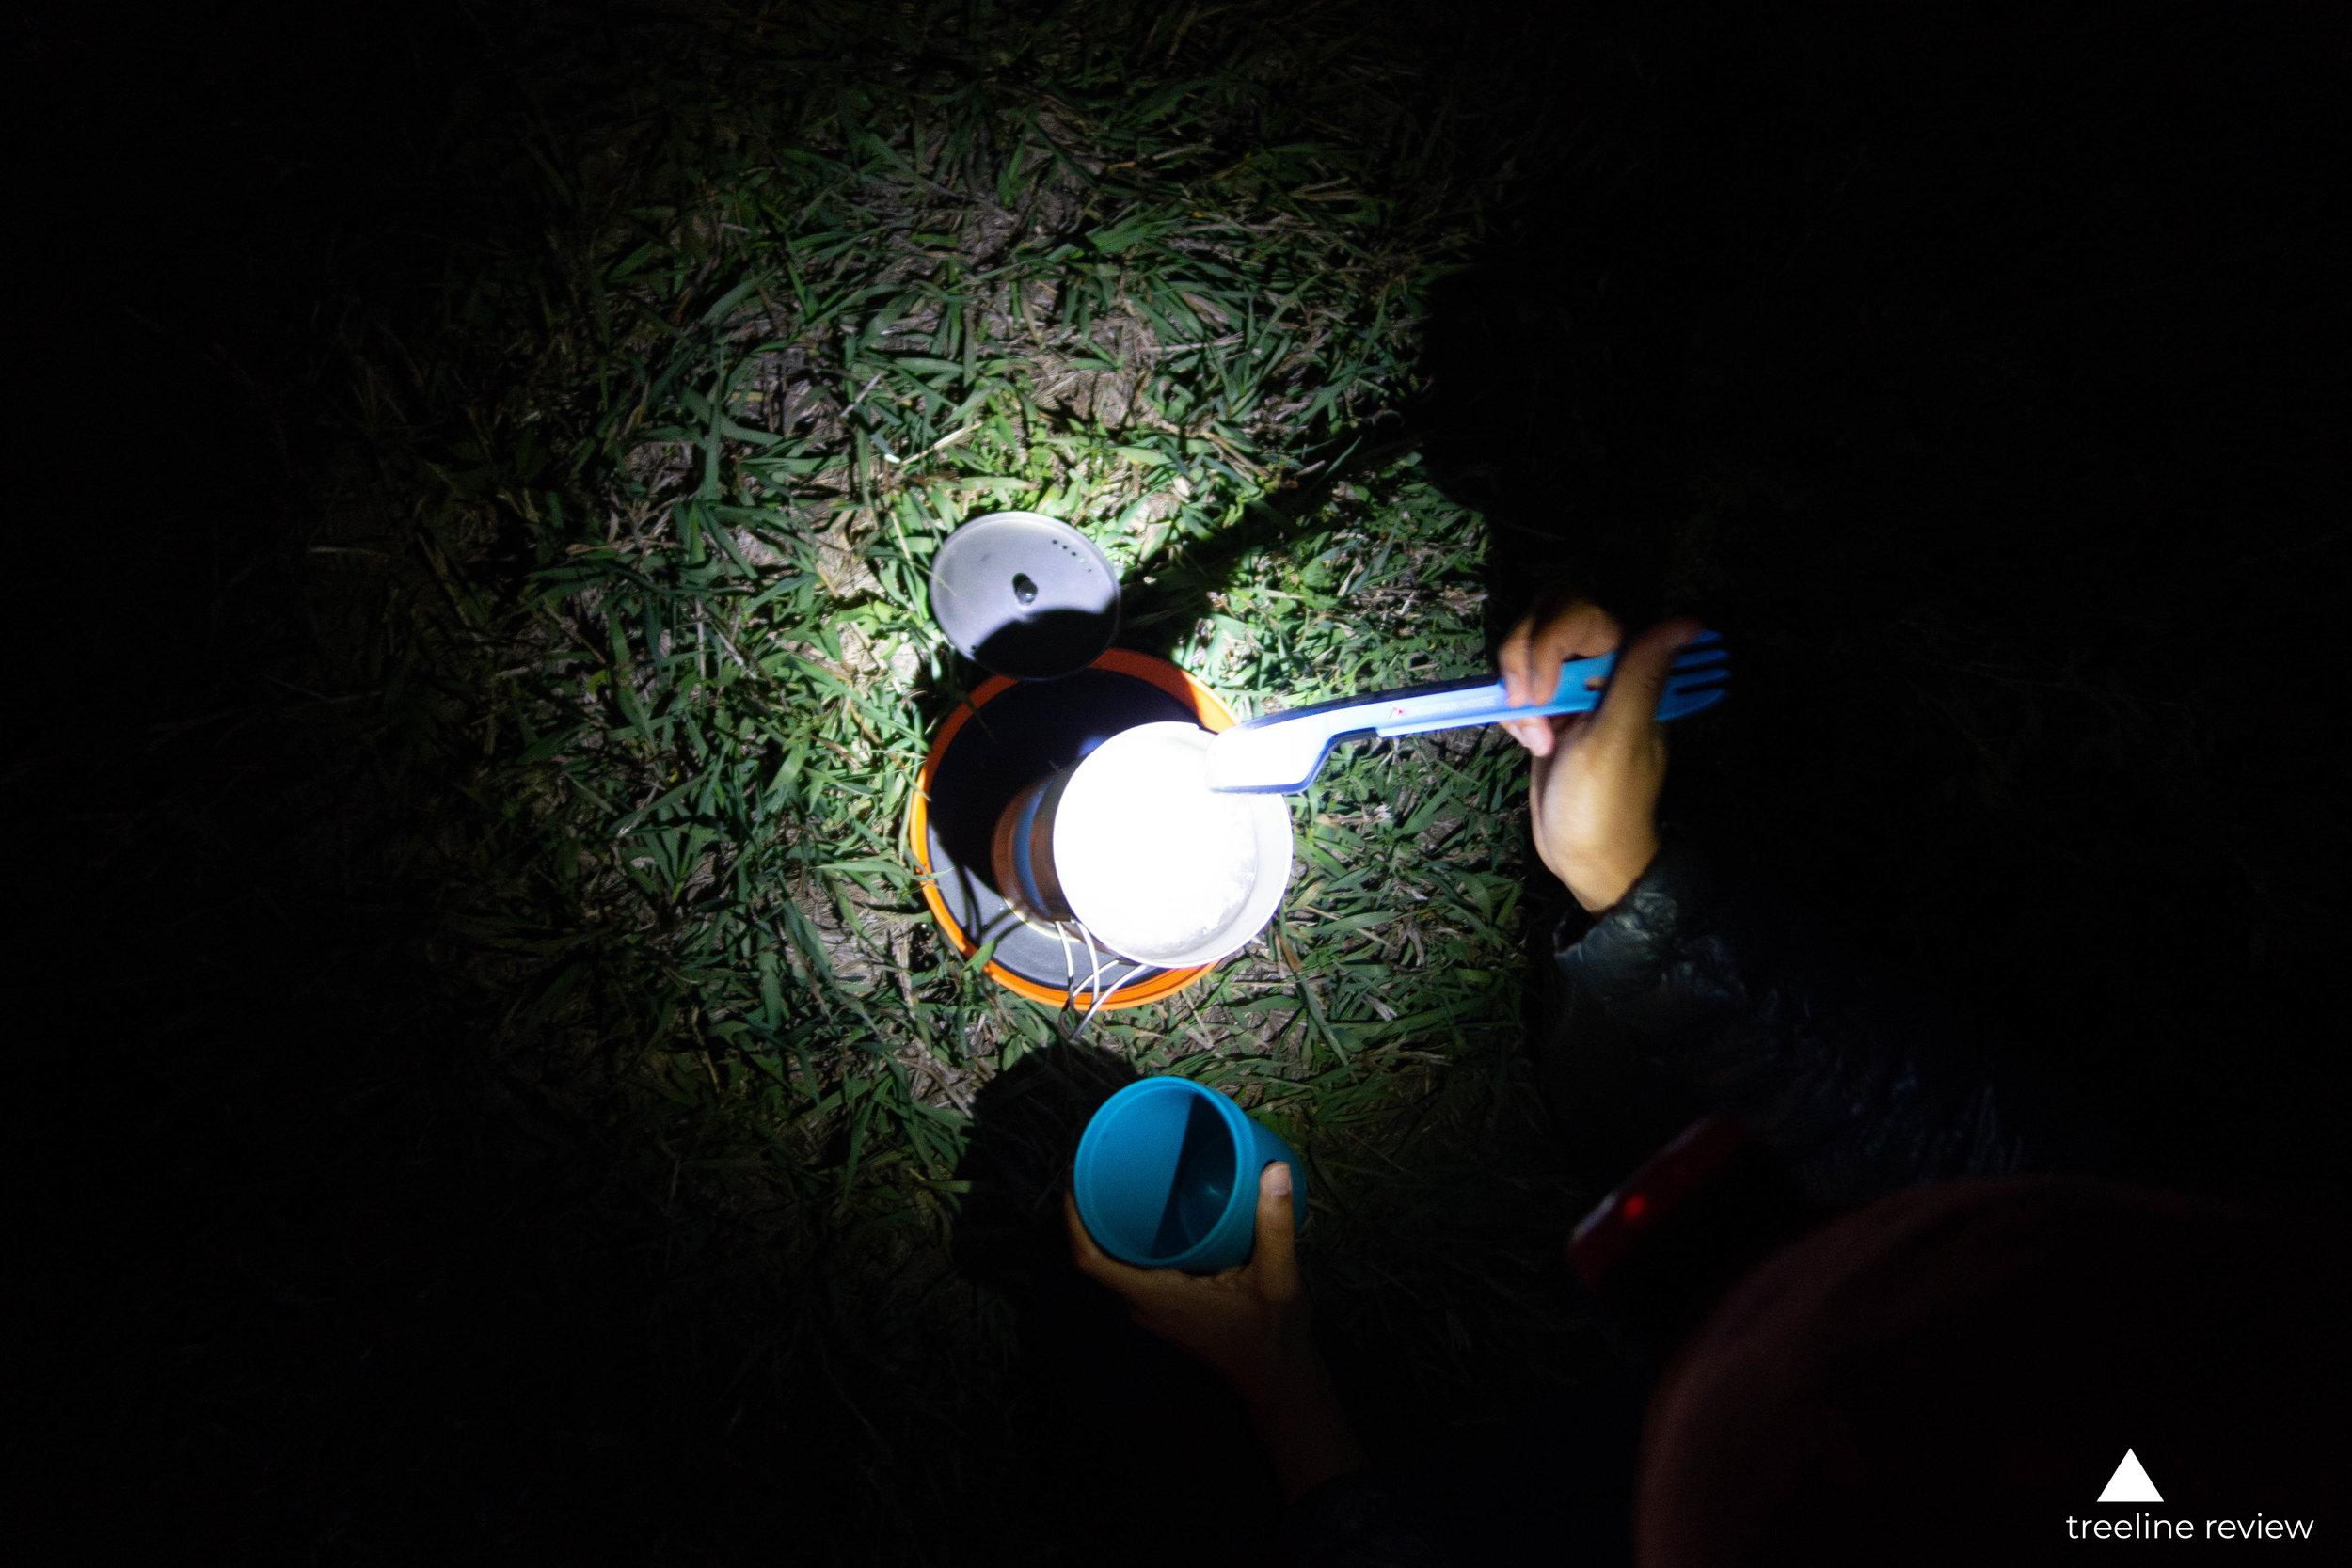 The Best Smart Headlamp - Petzl Reactik HeadlampRead more →